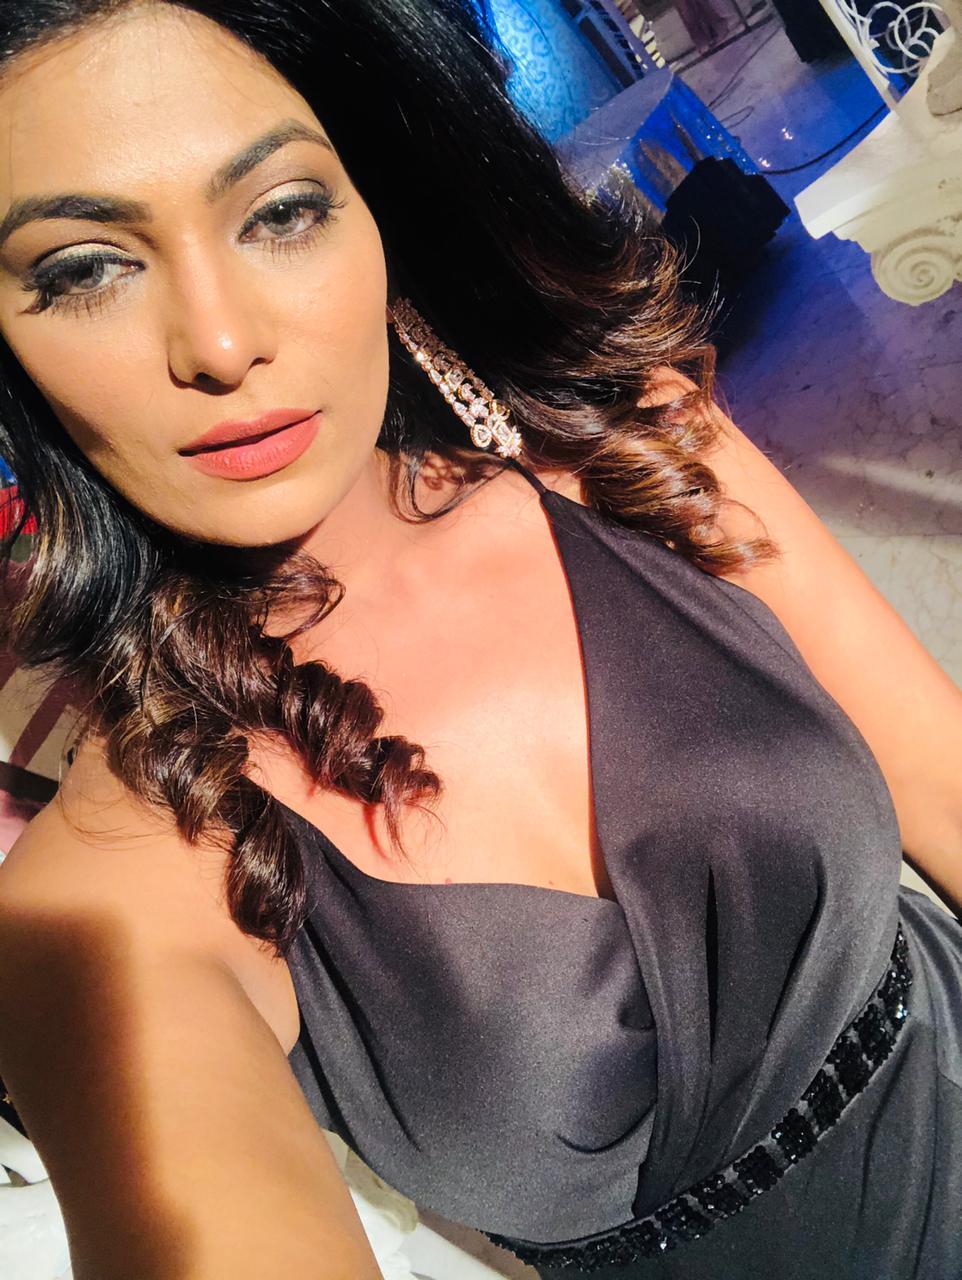 Ruchita-Sharma-the-city's-top-anchor-seen-in-the-popular-TV-serial-Kundali-Bhagya